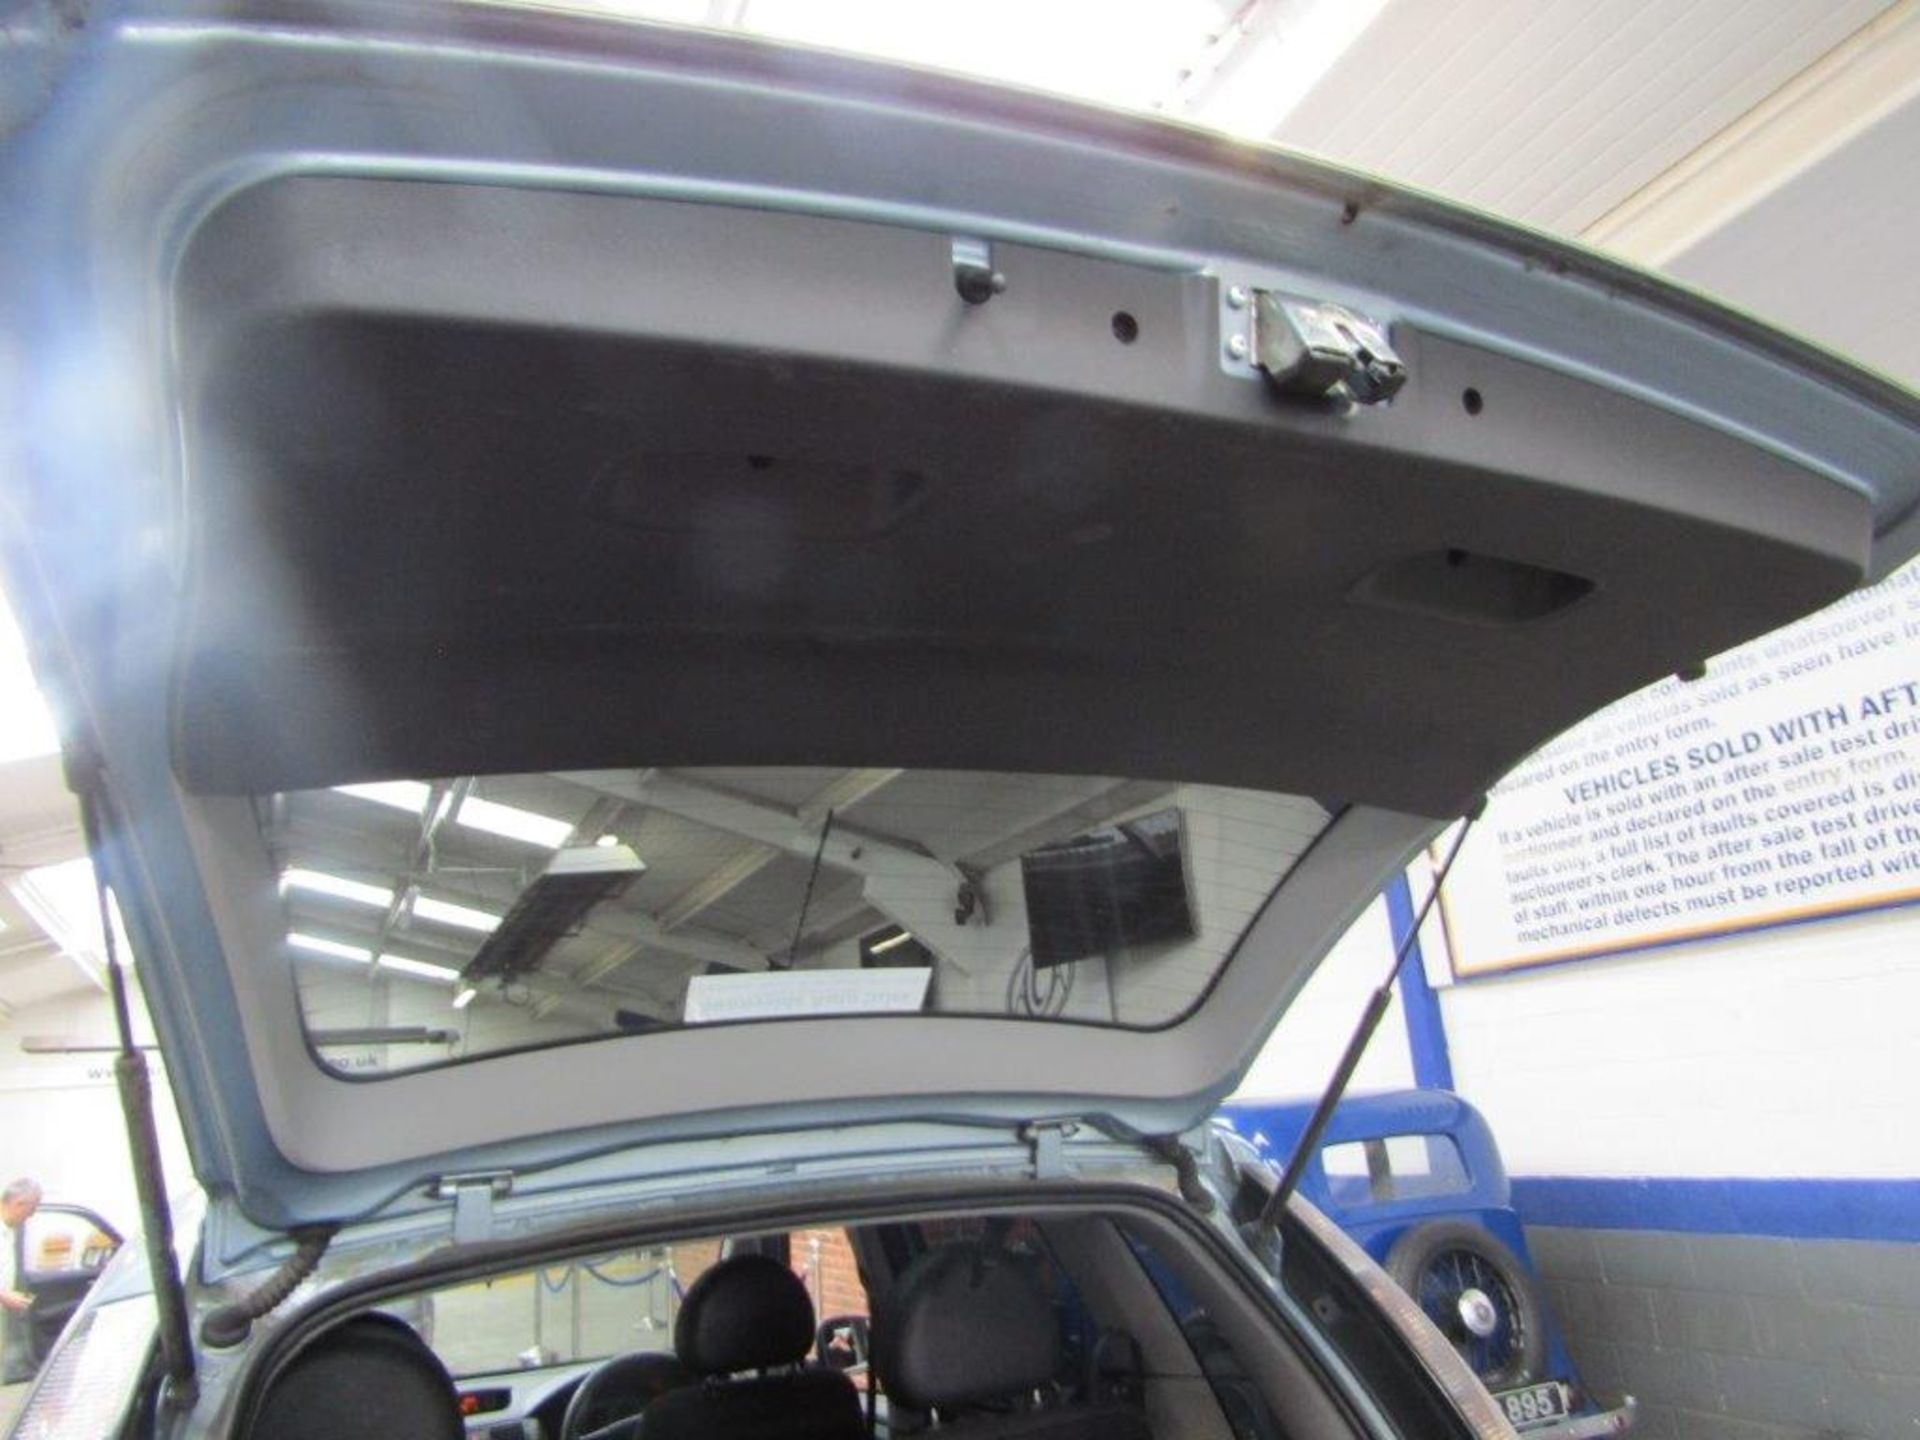 58 08 Vauxhall Meriva Design - Image 22 of 25